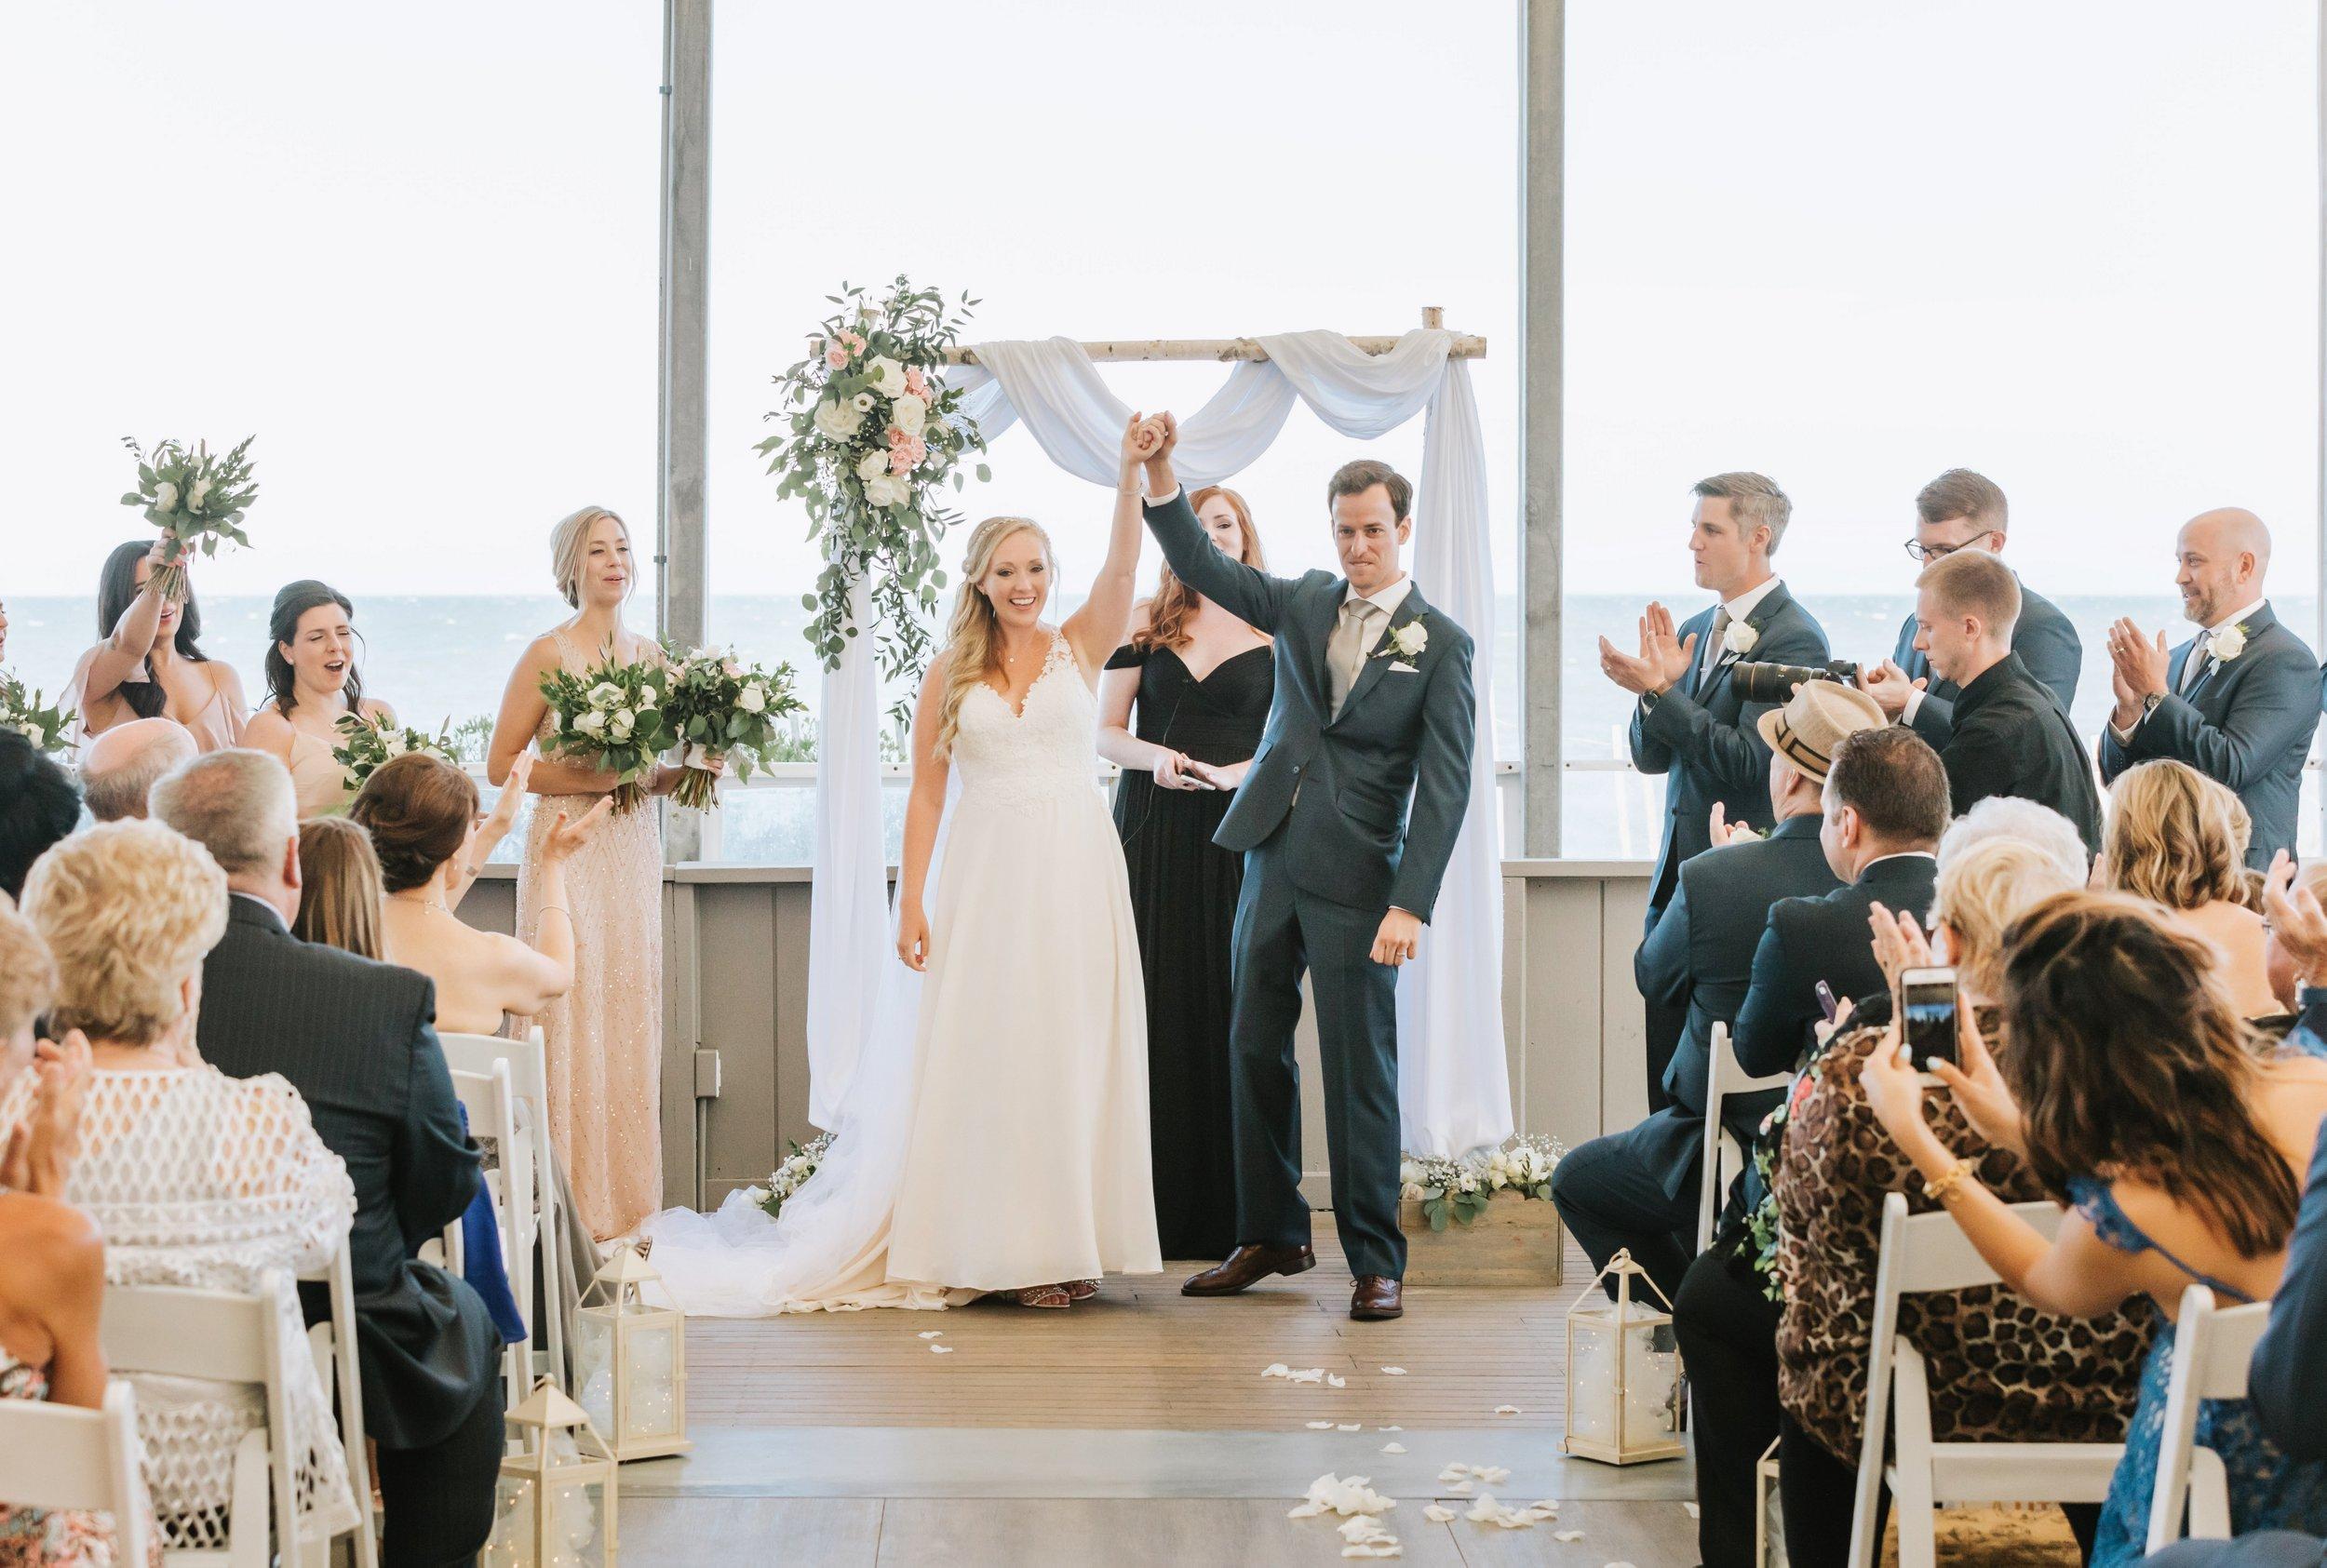 Popponesset-Inn-Wedding-Cape-Cod-Lena-Mirisola-Photography-37.jpg